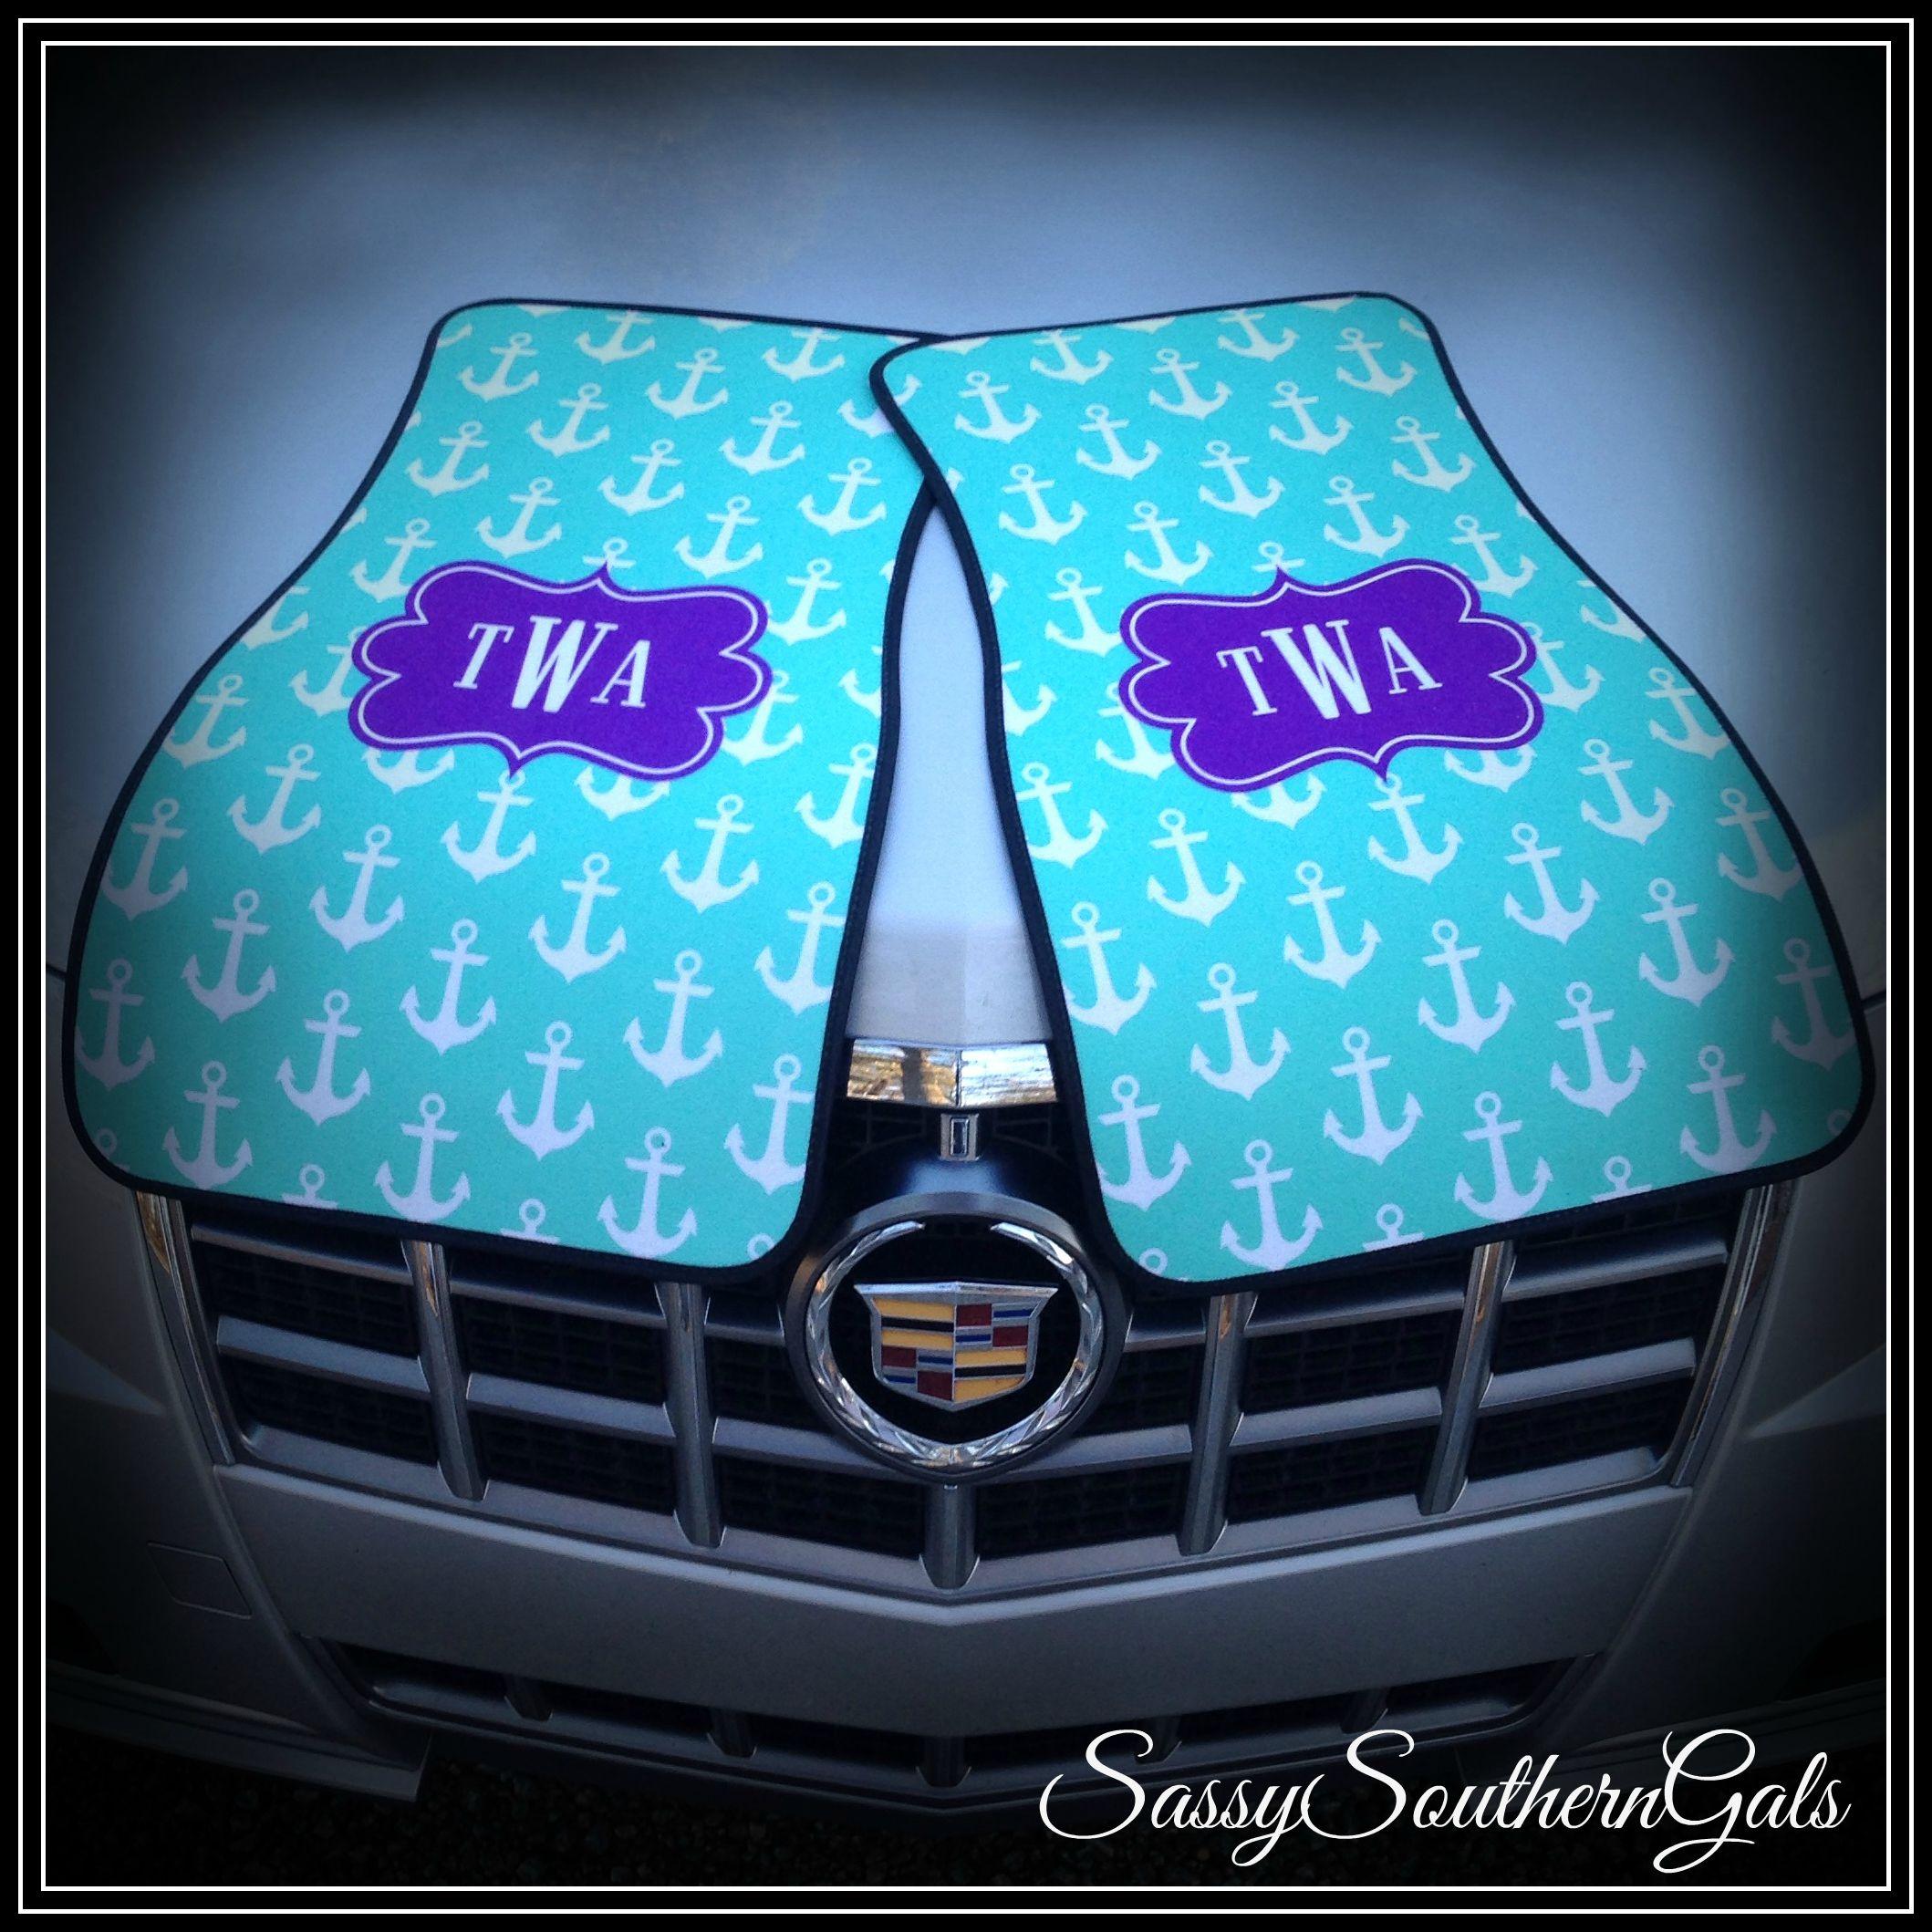 Car Mats Monogrammed Personalized Car Mats In 2020 Cute Car Accessories Preppy Car Accessories Personalized Car Mat